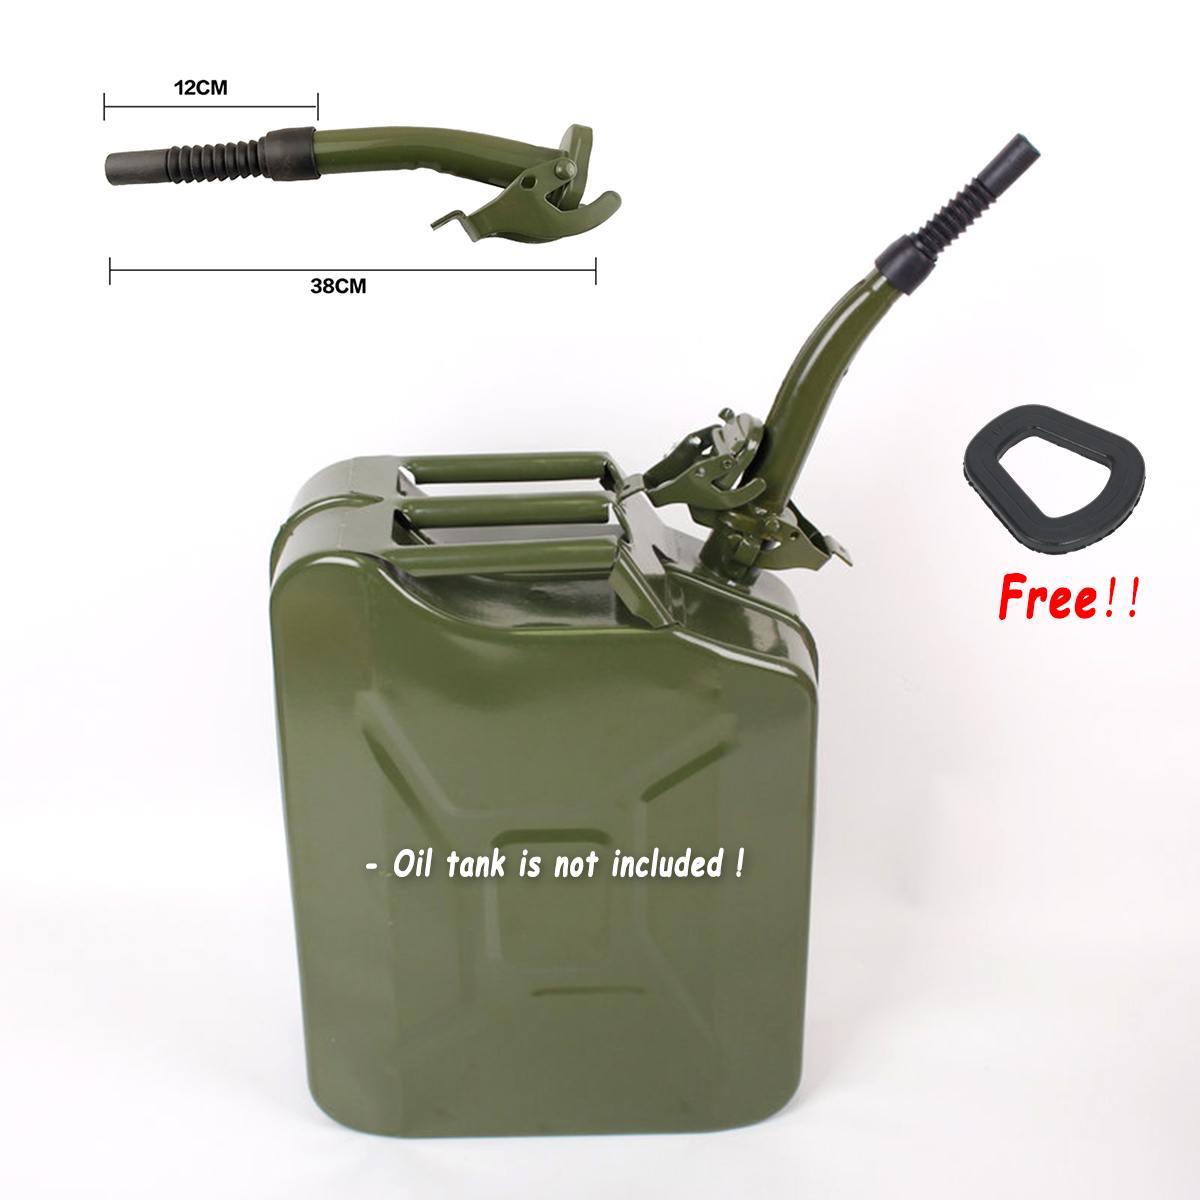 Para bidón de 5/10/20 litros de Metal de goma jerry Jerry Can verting boquilla Flexible gasolina combustible sello 38cm + junta de sellado